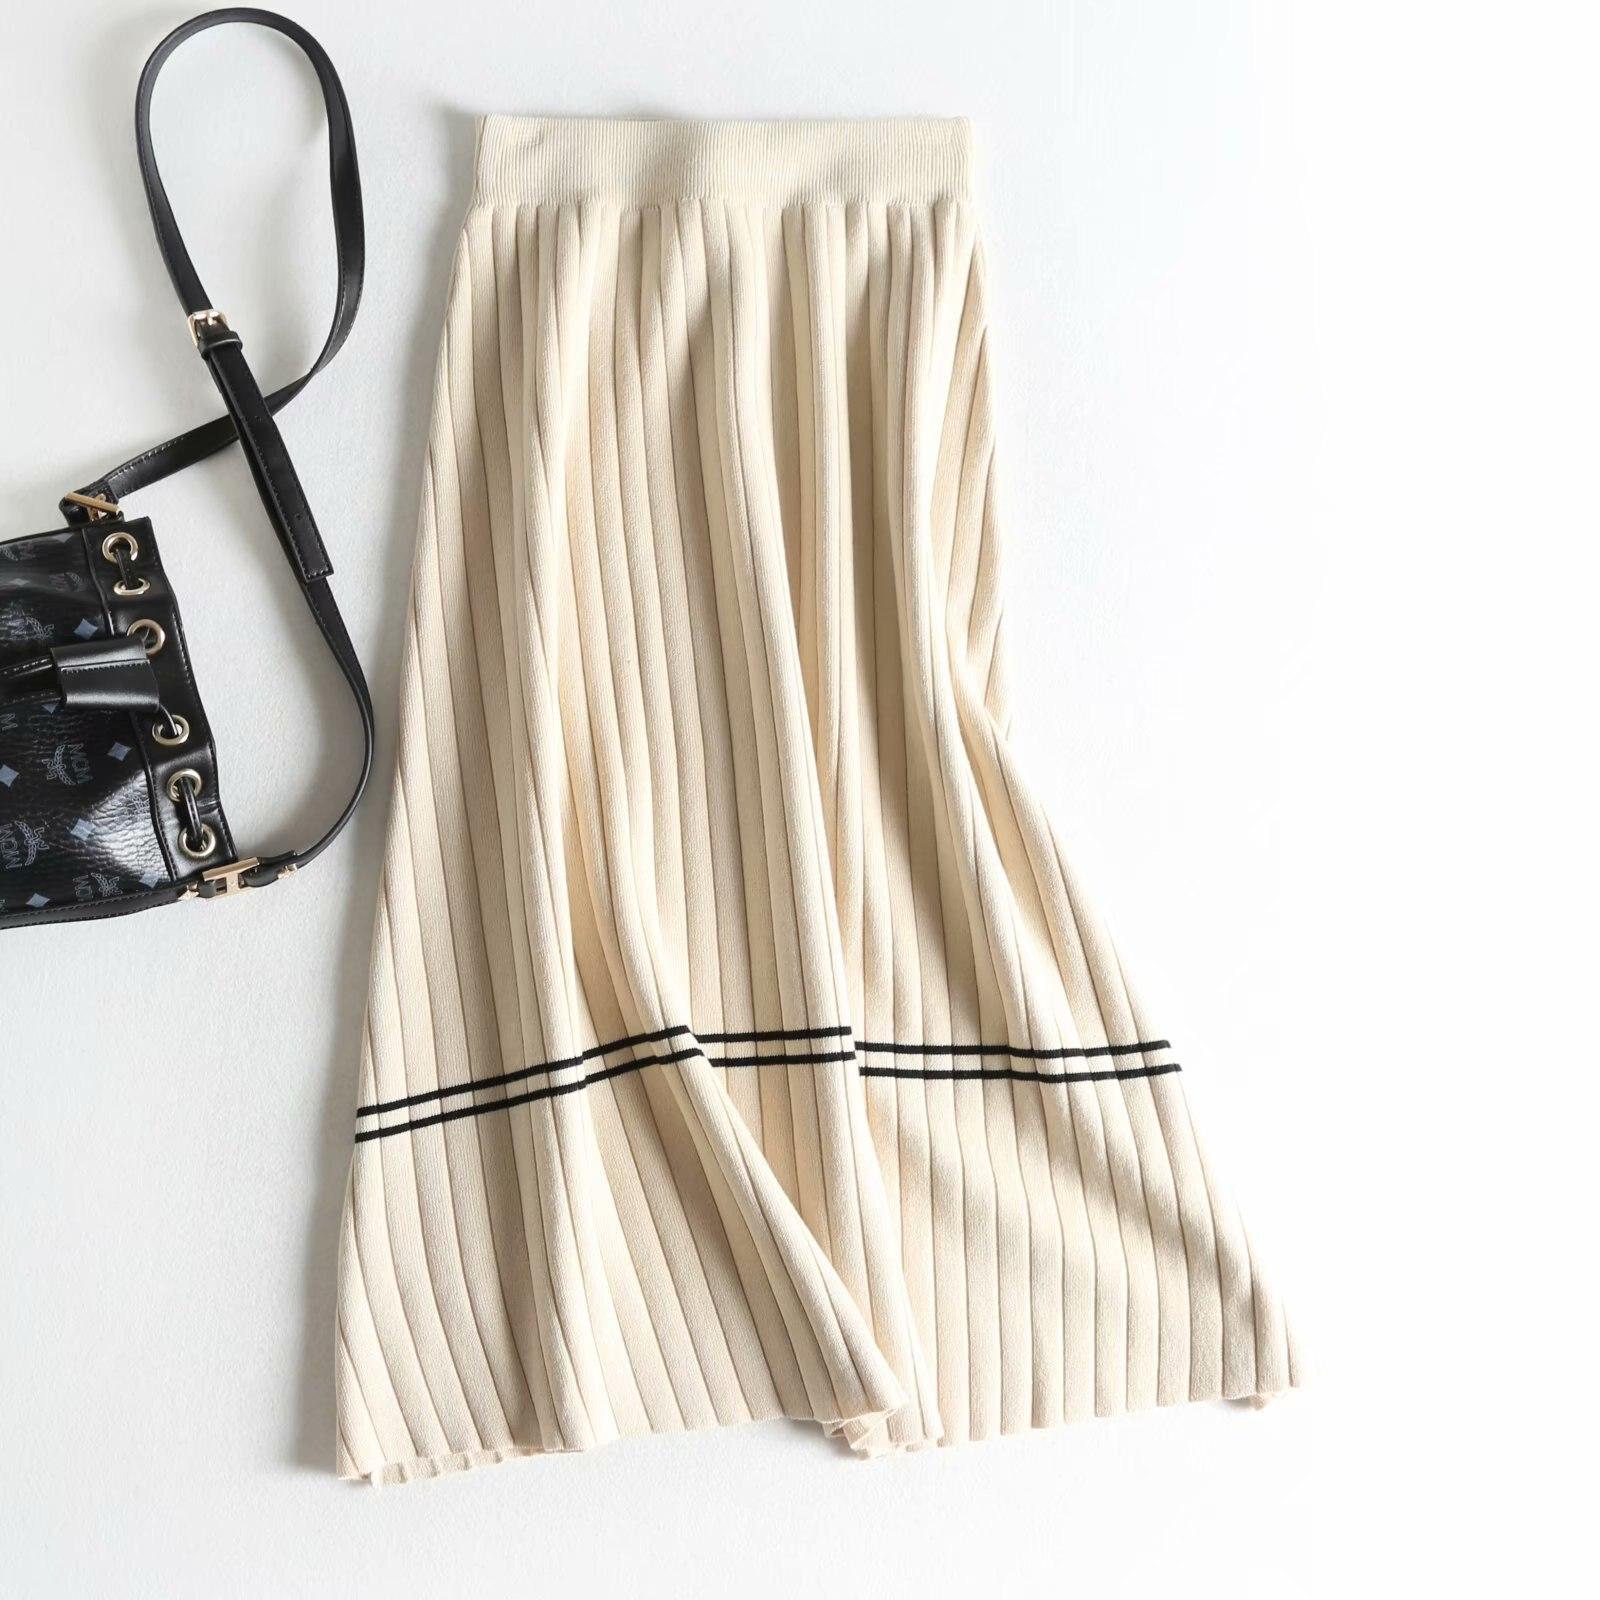 2019 High Waist Women Spring Skirts Vintage Knitting Women Long Skirt Faldas Jupe Femme Women Beige Black Skirt Saia 2